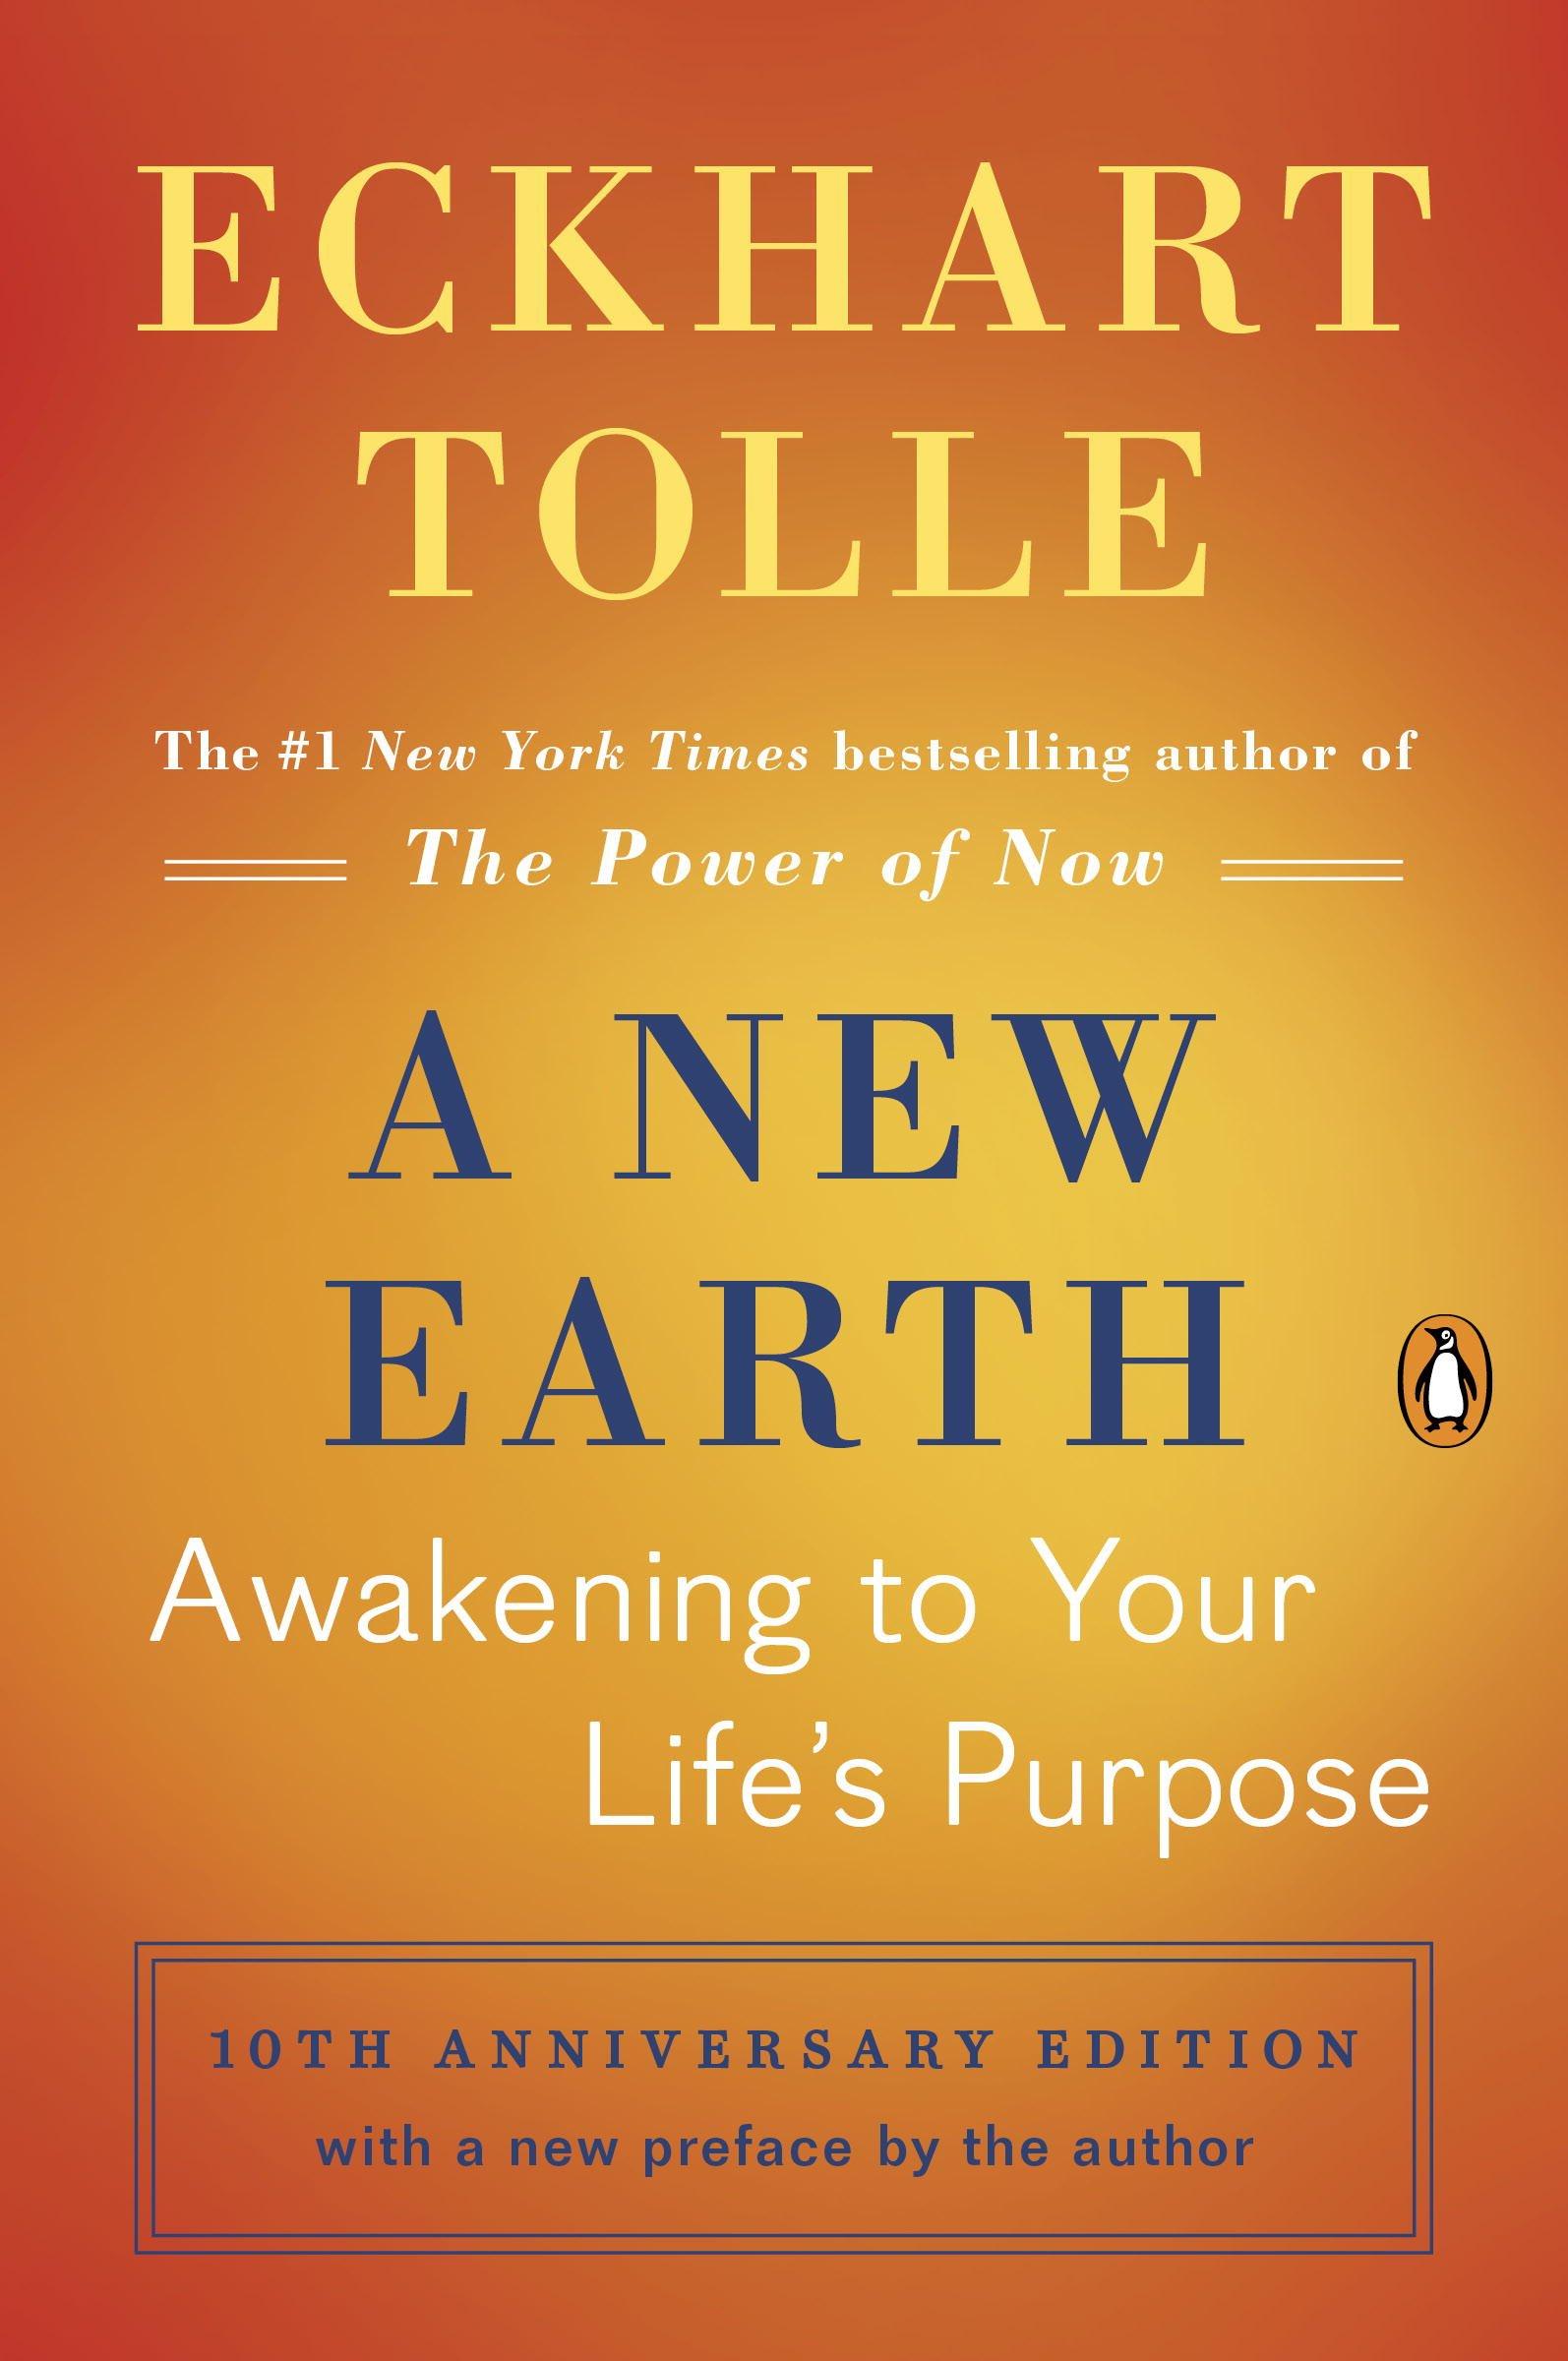 TestAsin_B079GLR25Y_A New Earth (Oprah #61): Awakening to Your Life's Purpose: TestAsin_B079GLR25Y_Awakening to Your Life's Purpose